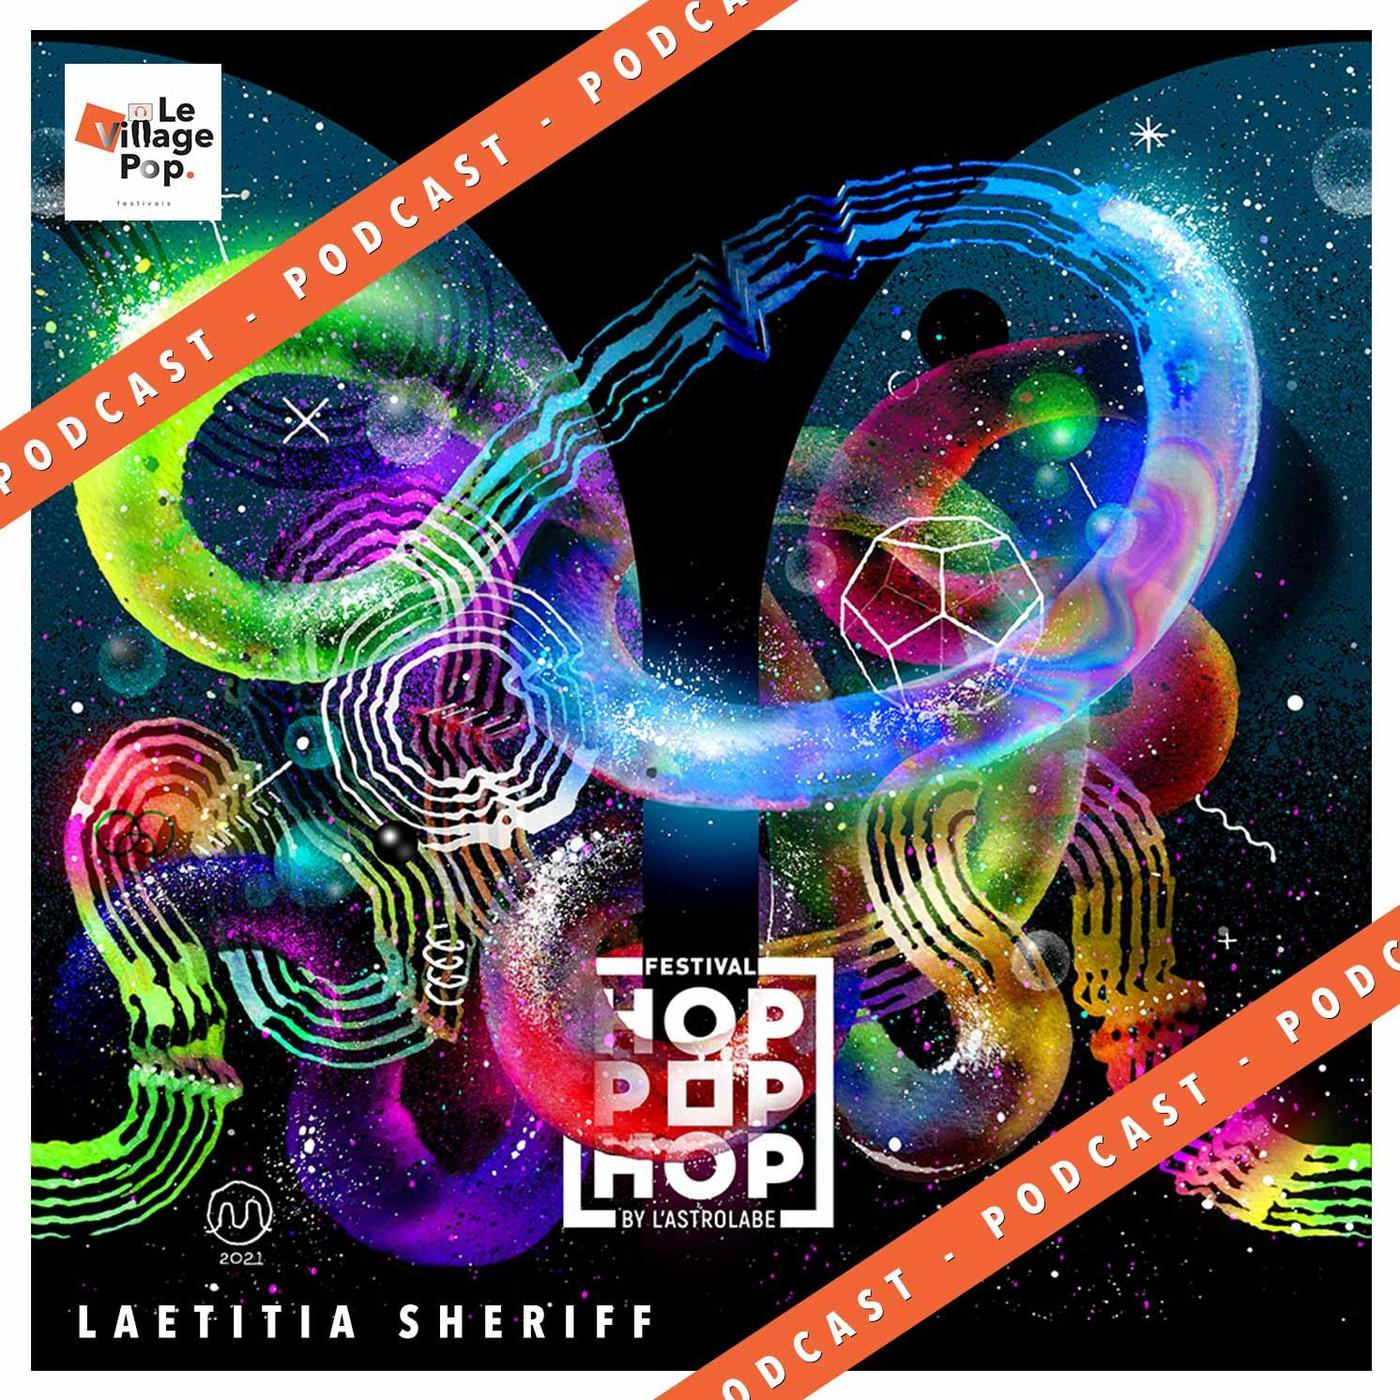 Festival HOP POP HOP 2021 - Laetitia Shériff